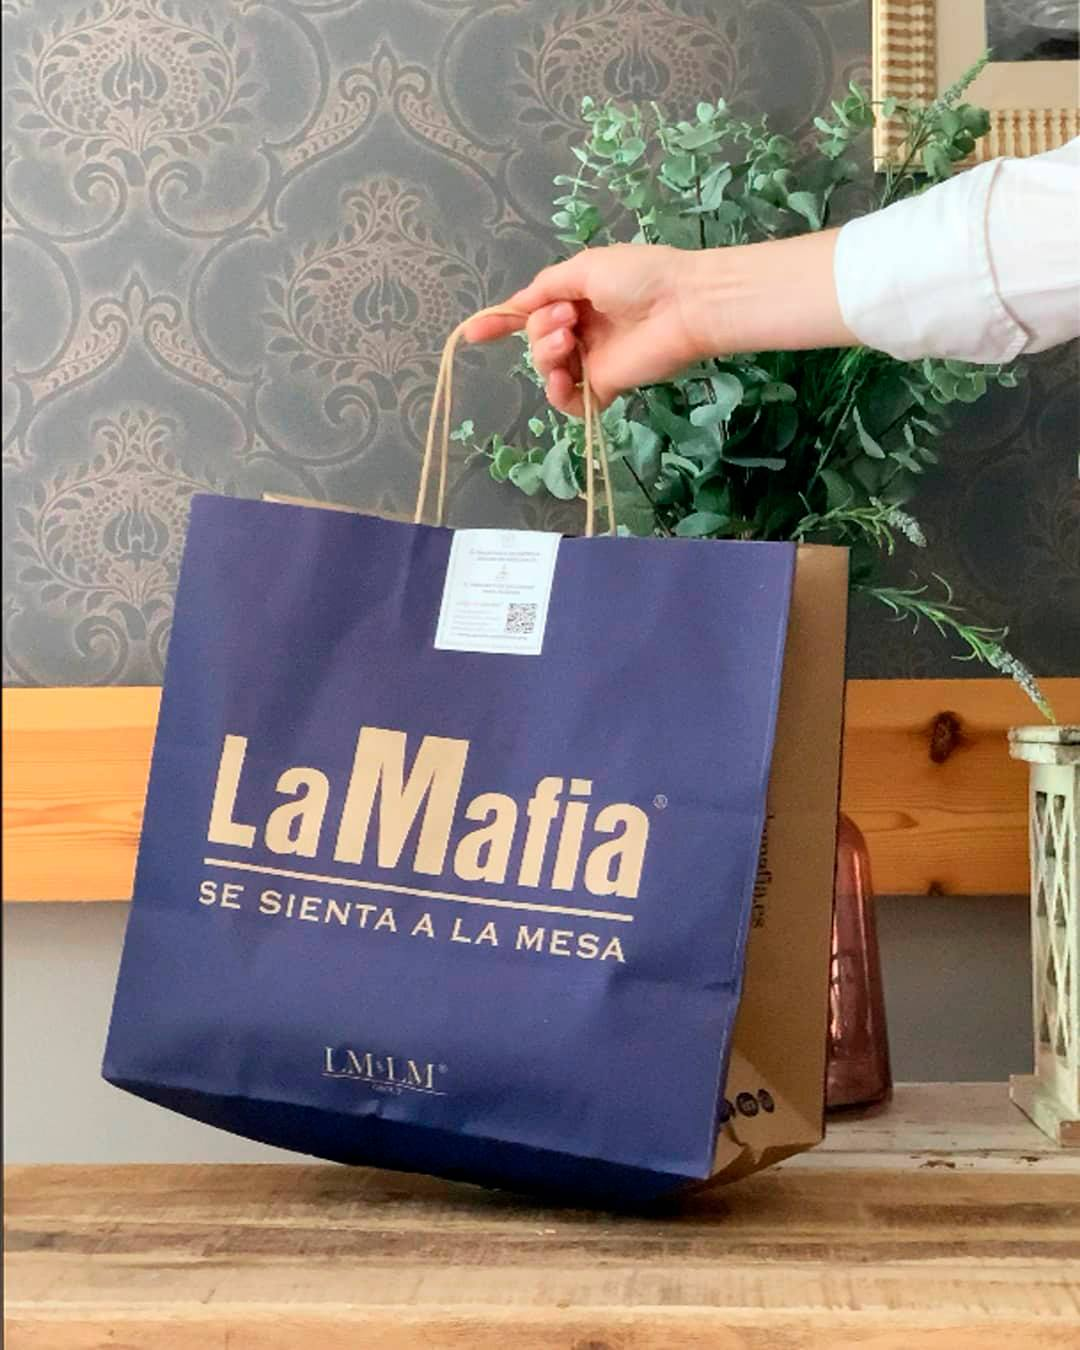 la mafia se sienta a la mesa crece y se adapta al covid - En 'La Mafia se sienta a la mesa' llegaremos hasta Cadiz